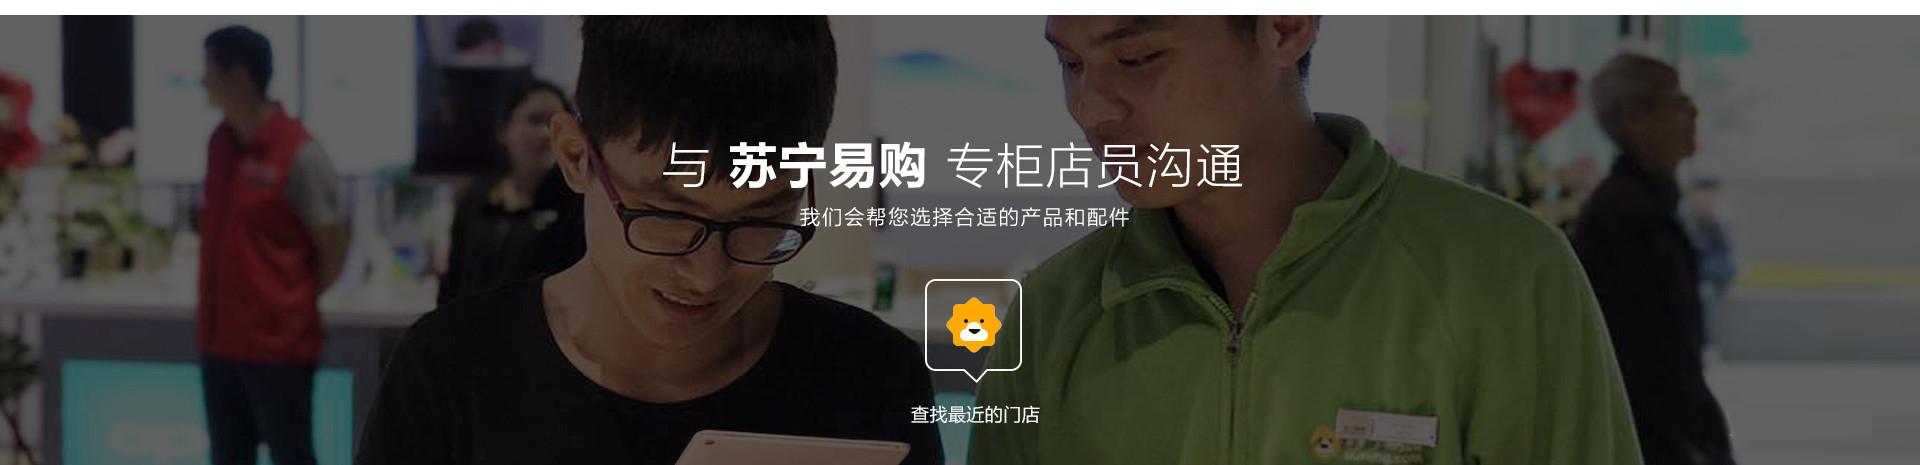 http://image.suning.cn/uimg/sop/commodity/170065930873627747979330_x.jpg